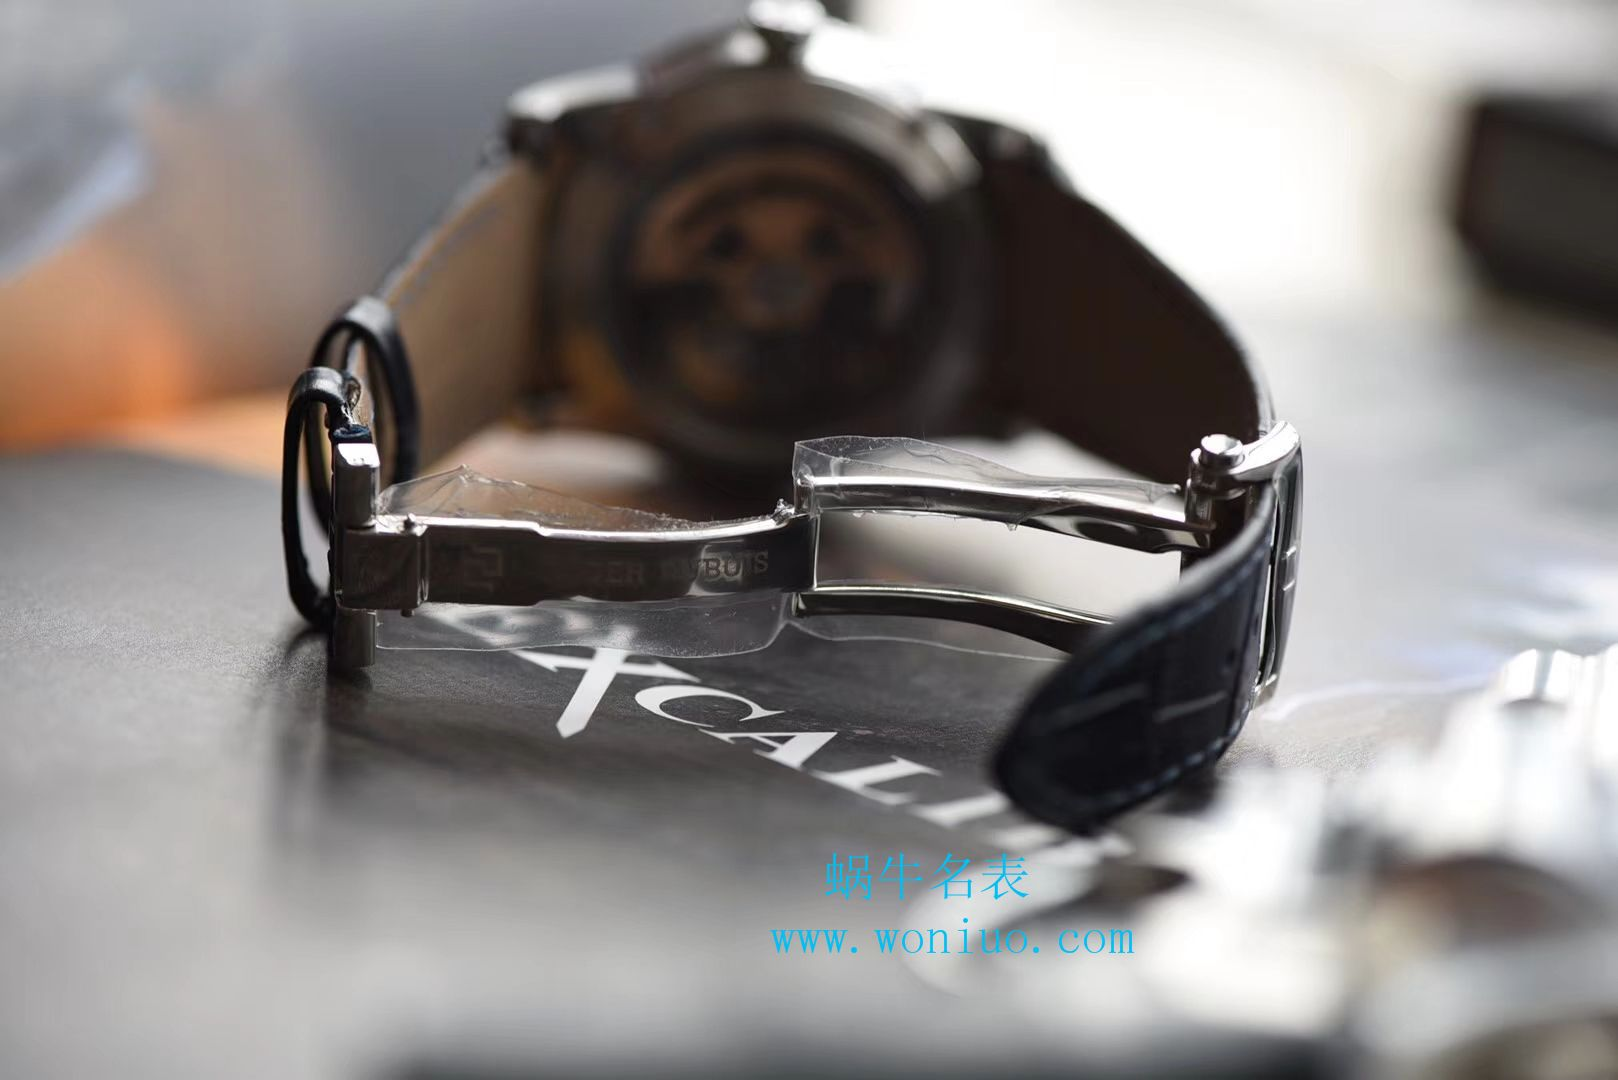 视频评测ROGER DUBUIS罗杰杜彼EXCALIBUR(王者系列)系列DBEX0535腕表【RD一比一高仿手表】 / LJ008MM